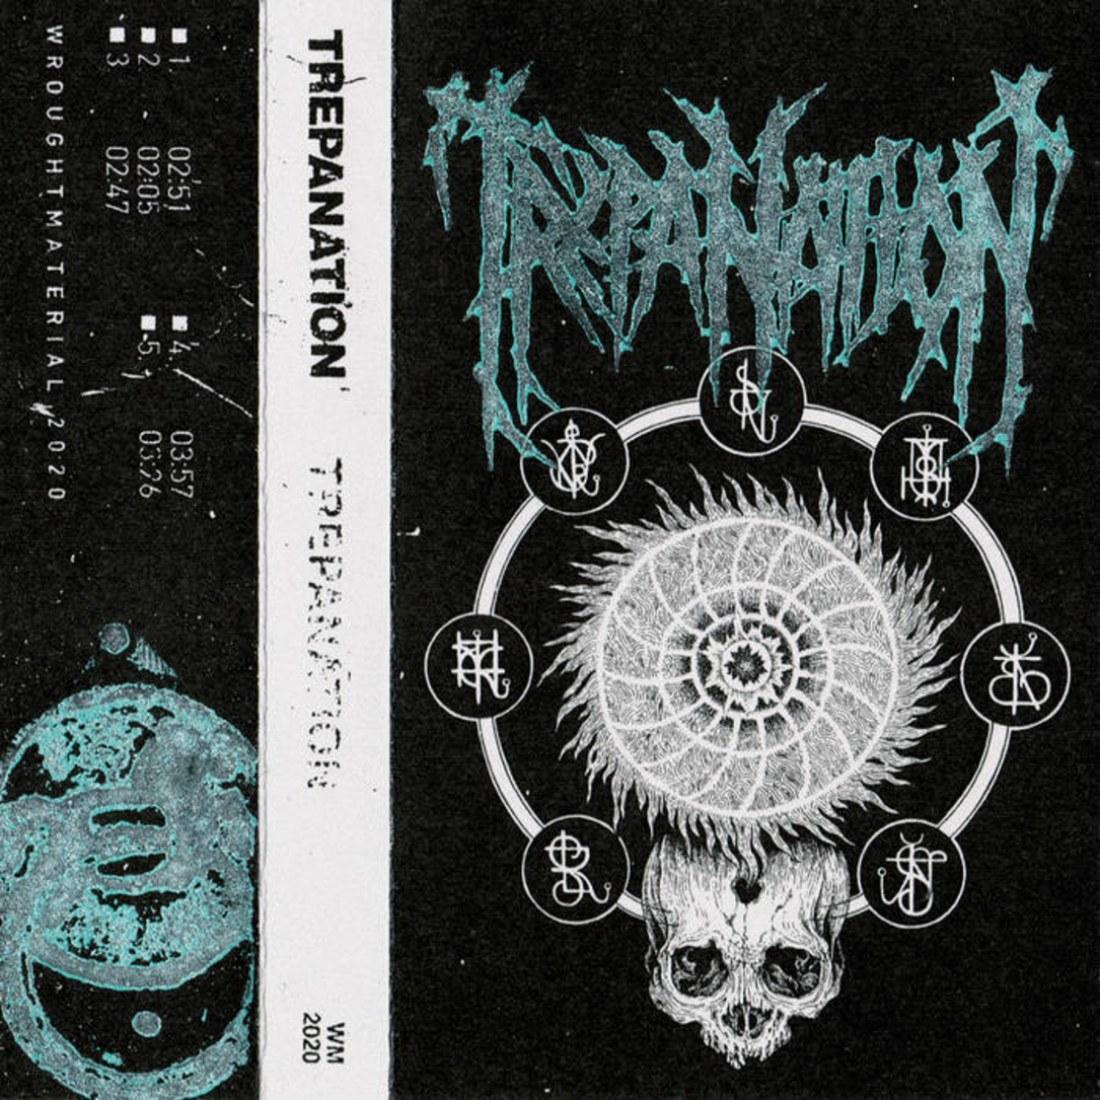 Reviews for Trepanation - Trepanation